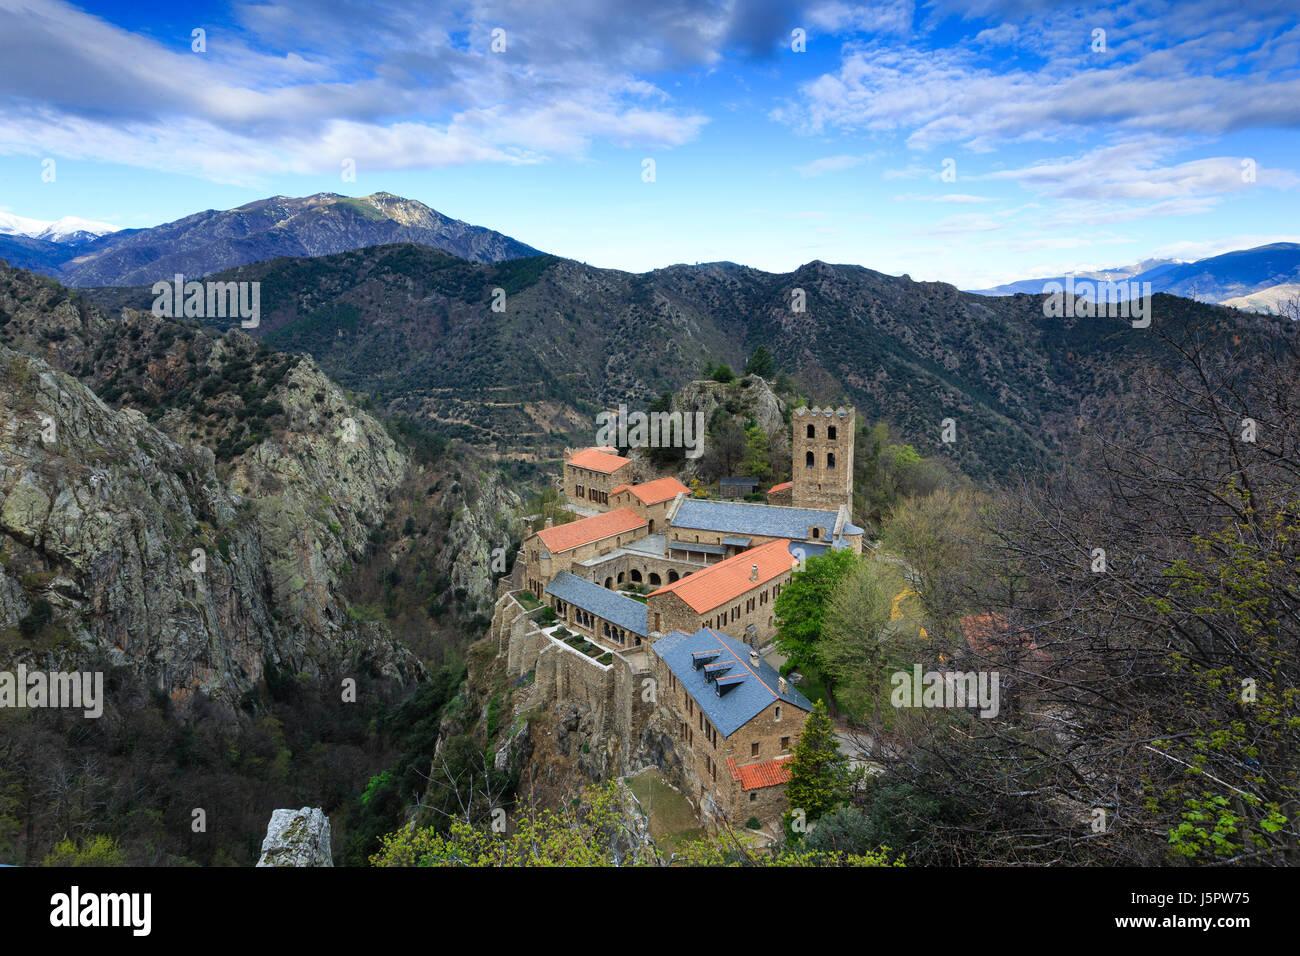 France, Pyrénées-Orientales (66), Casteil, abbaye Saint-Martin du Canigou // France, Pyrenees Orientales, Photo Stock